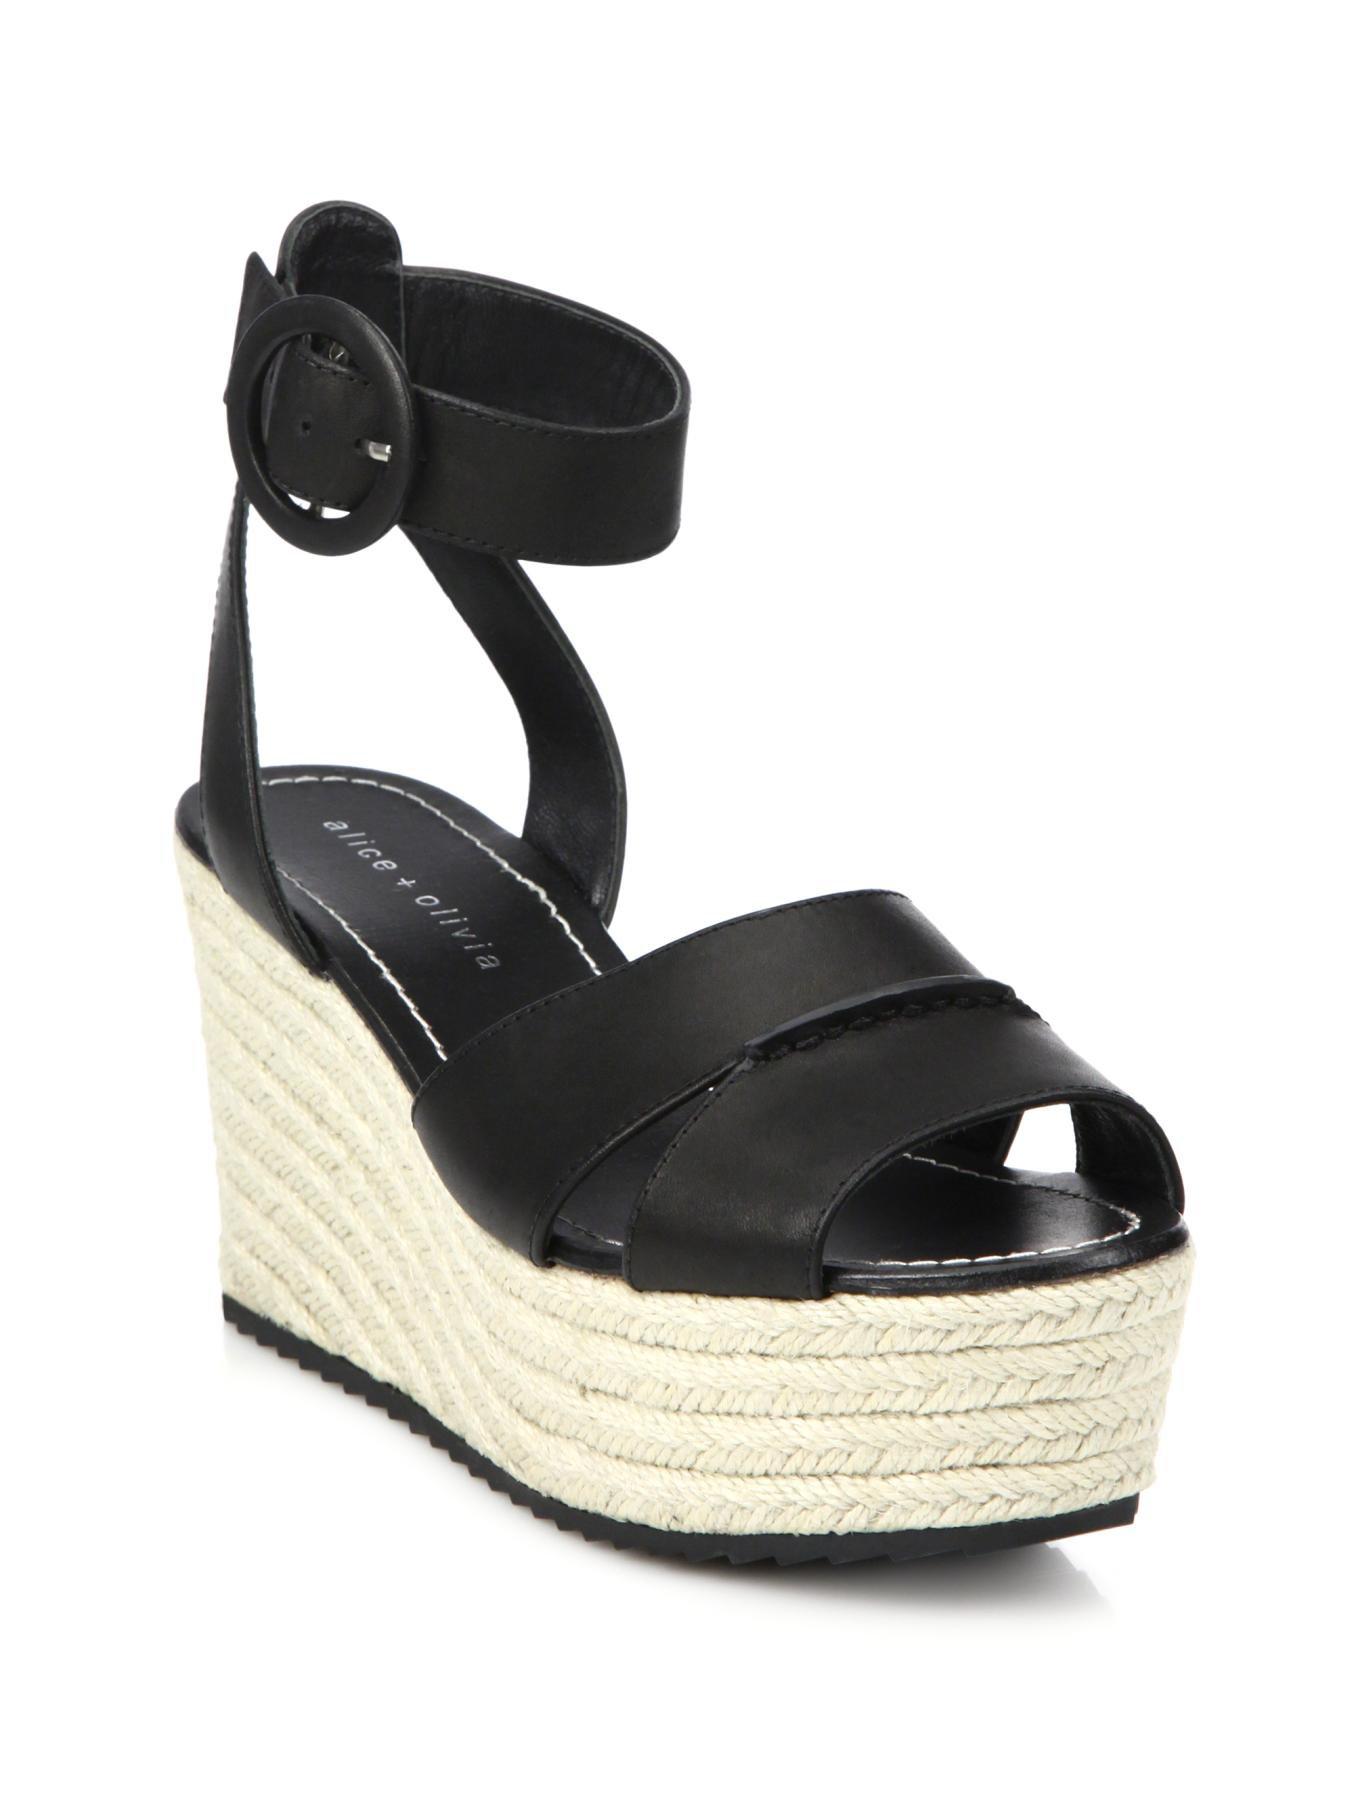 Alice + Olivia Brogue Leather Sandals footlocker finishline sale online 100% guaranteed online new online a7CM6AFP3